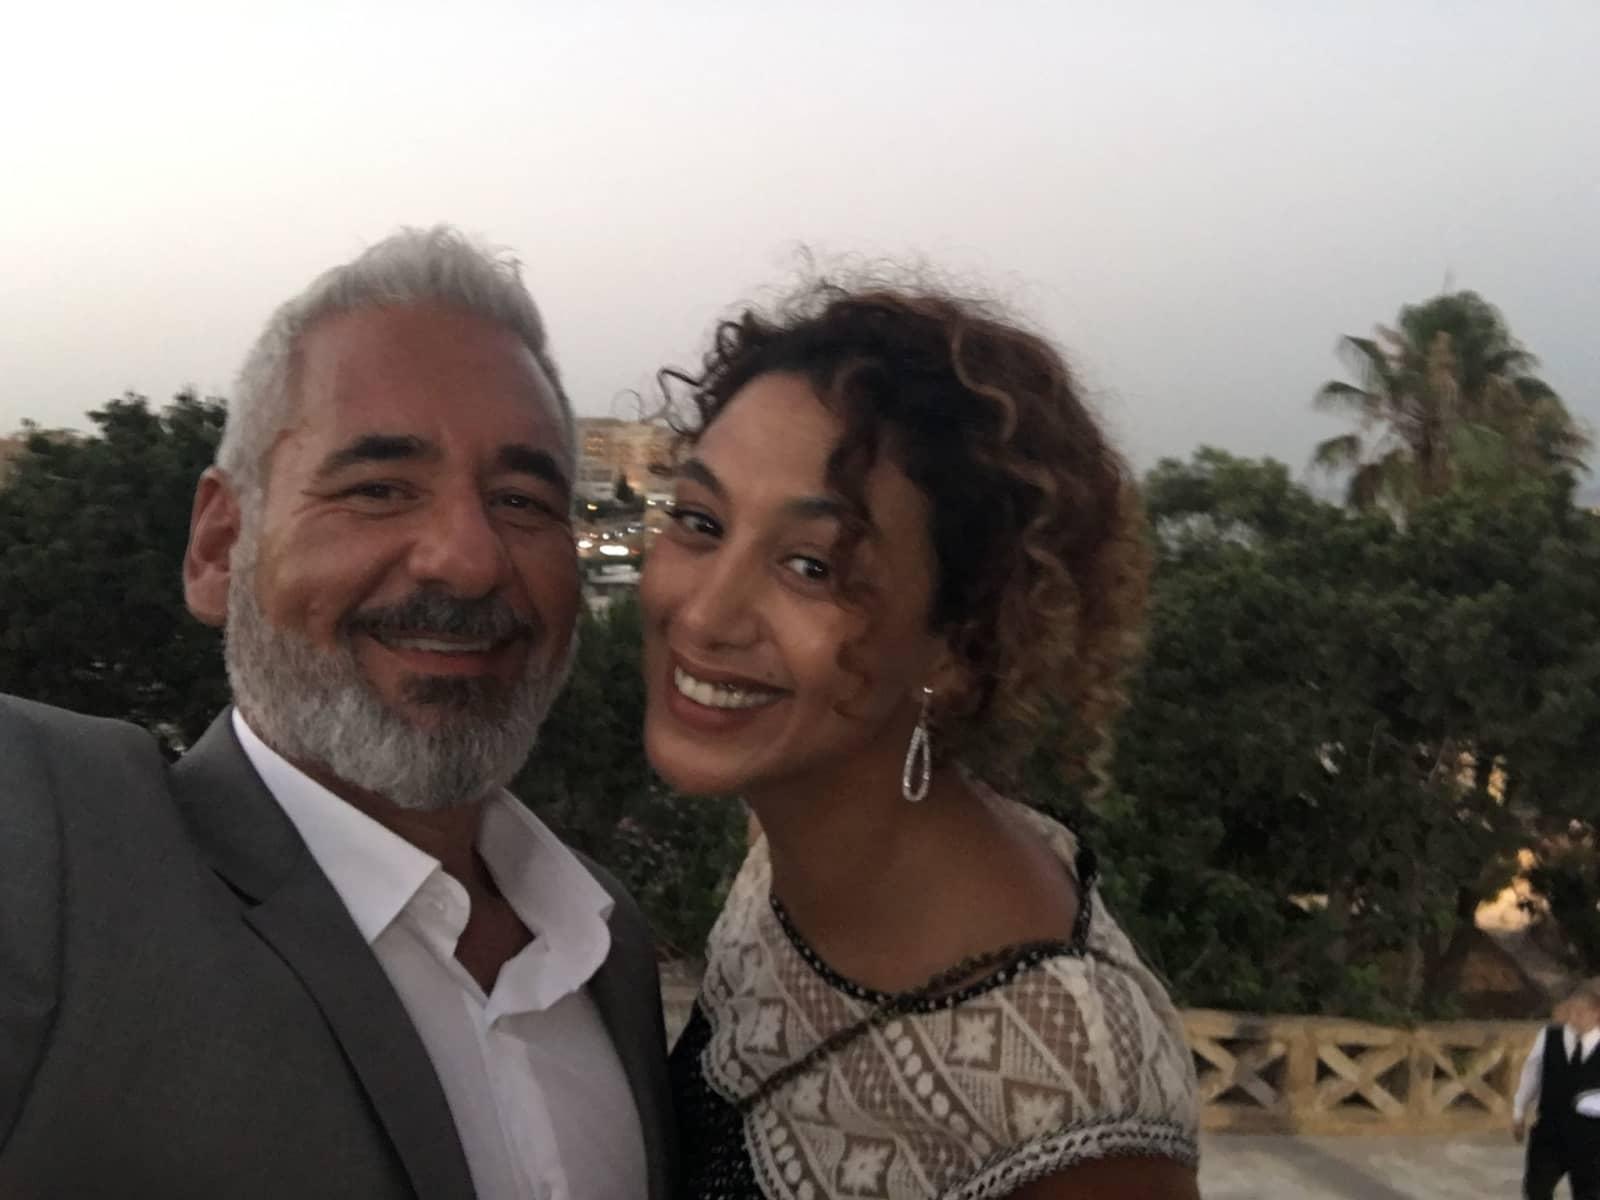 Paul & Soraya from Swieqi, Malta